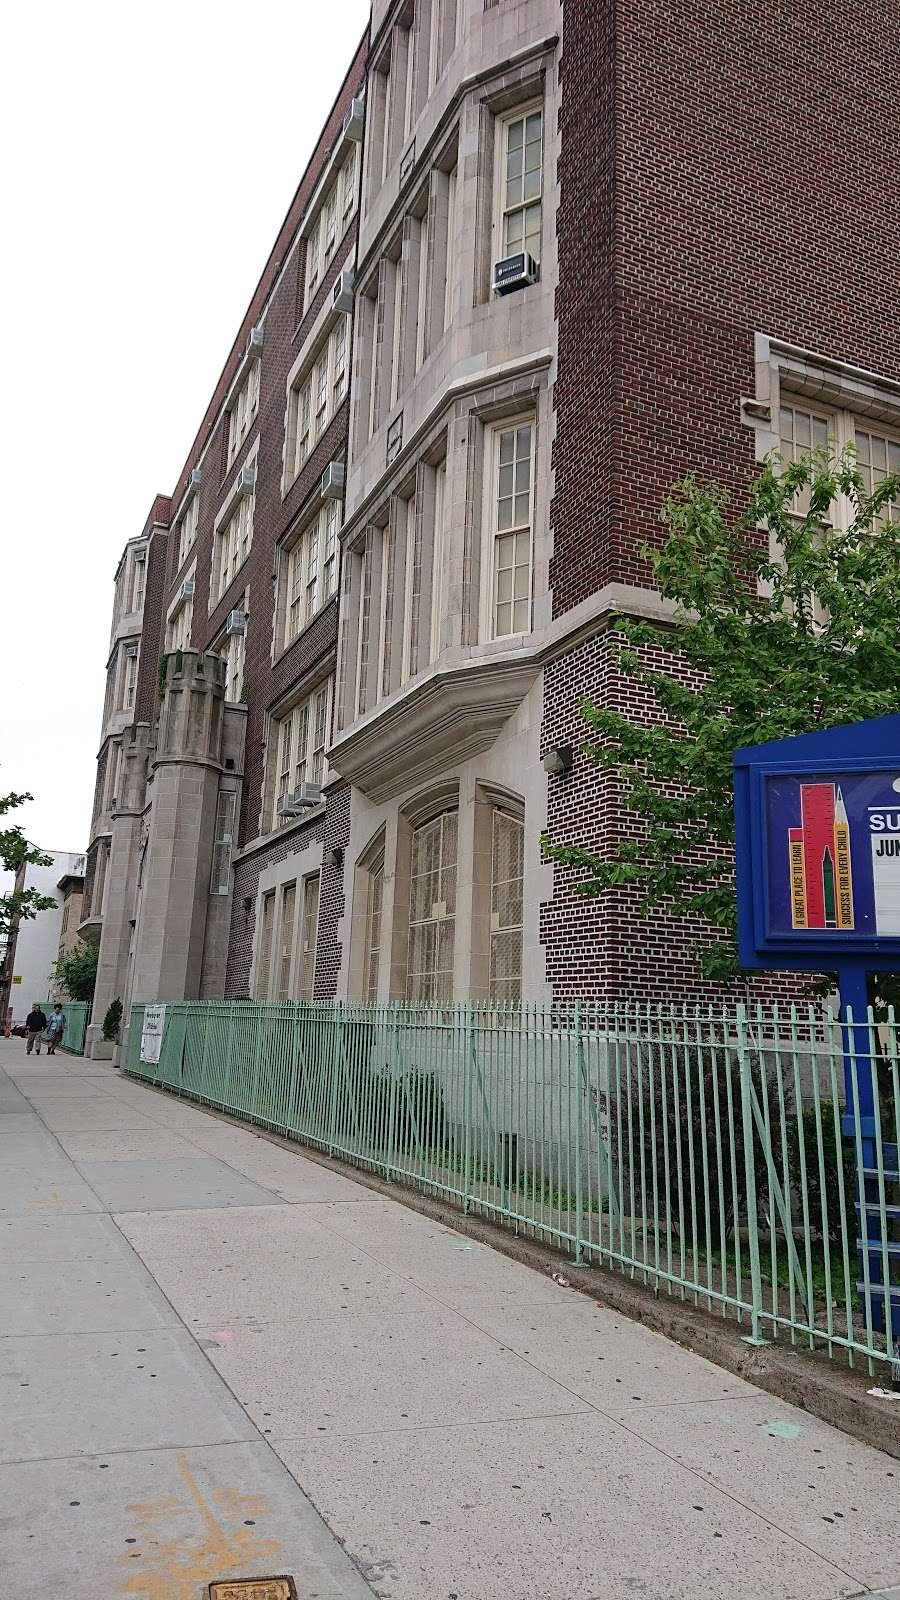 Sunset Park School - school  | Photo 5 of 10 | Address: 4305 7th Ave, Brooklyn, NY 11232, USA | Phone: (718) 853-3224